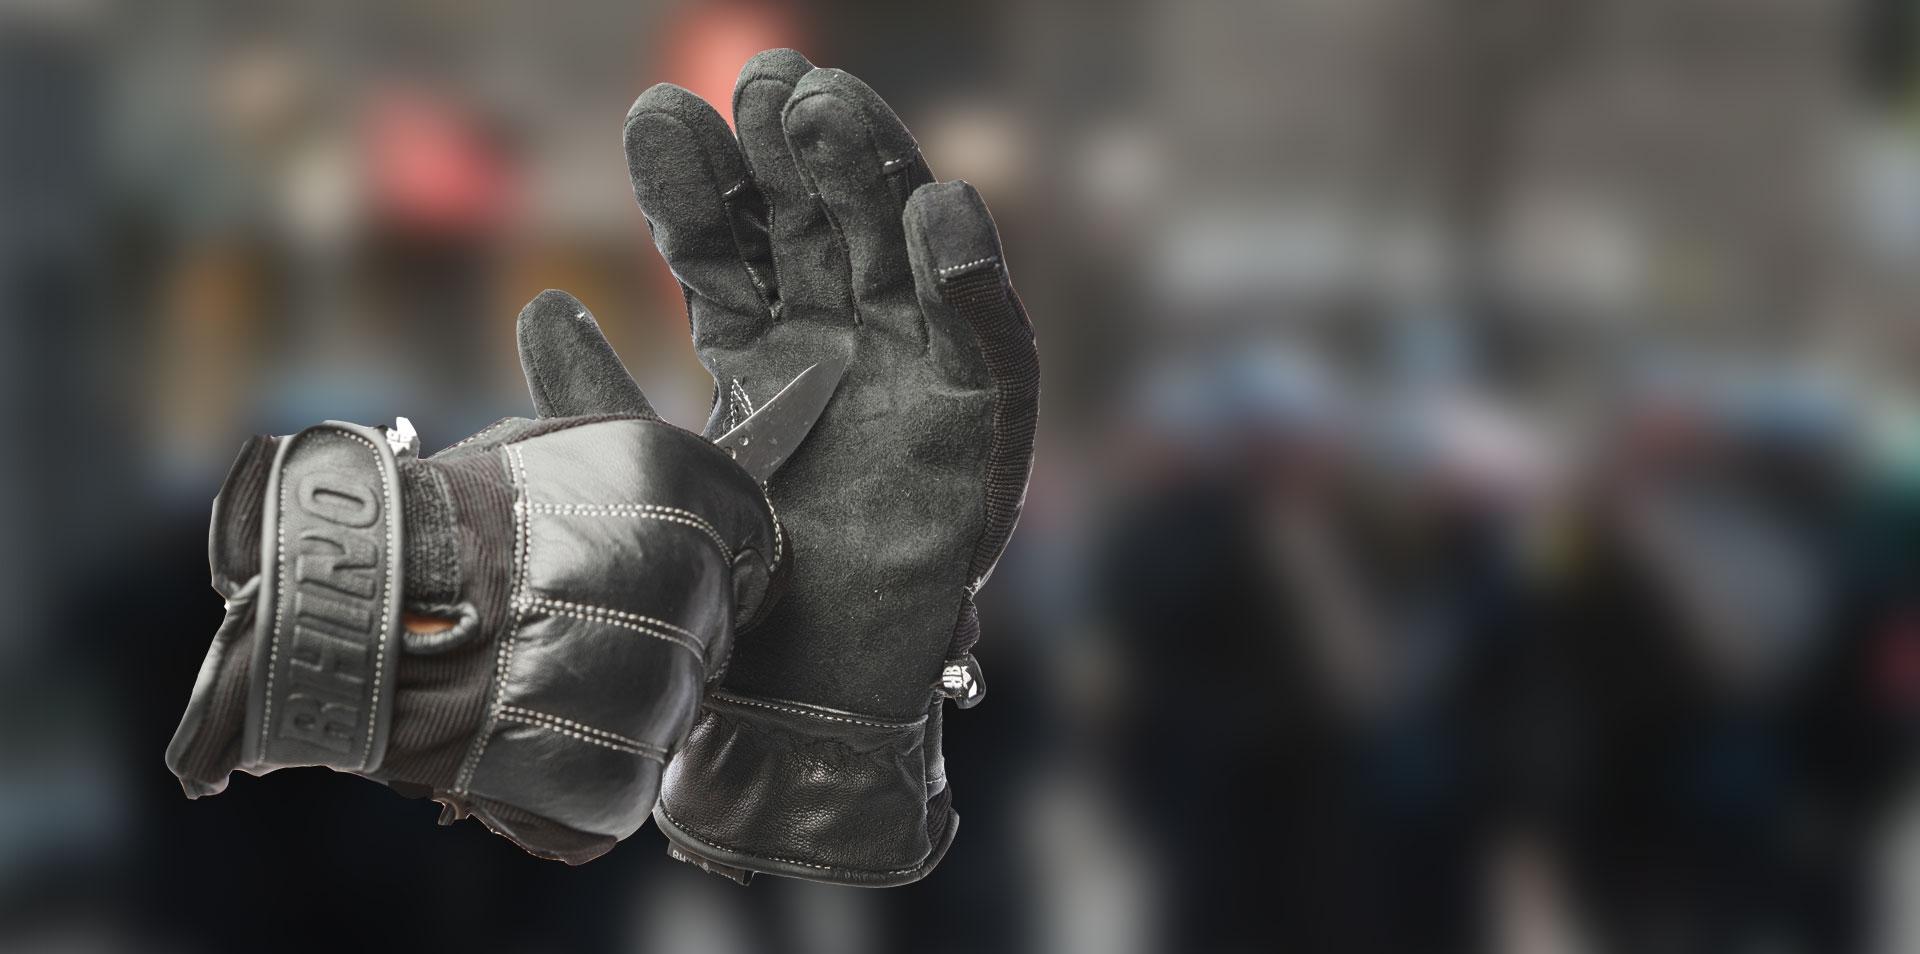 Rhino Duty Gloves